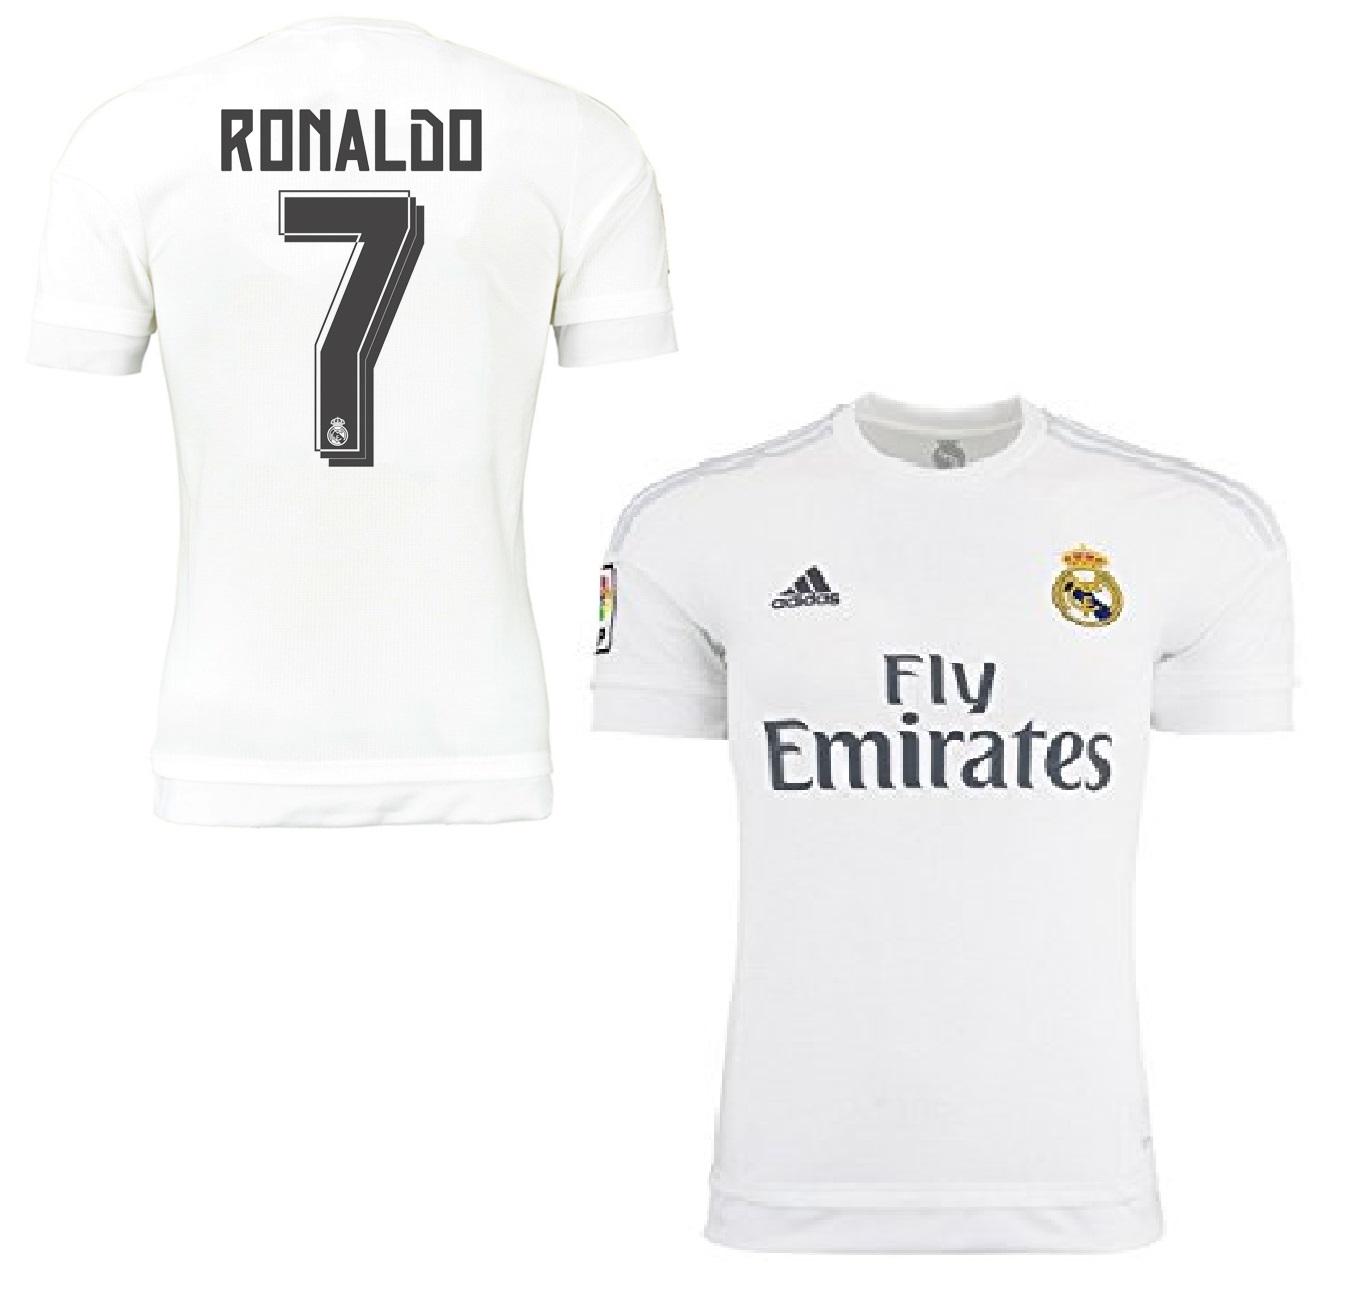 3079f2d3b Adidas Real Madrid jersey 7 Ronaldo 2015/16 Emirates home white men's M or